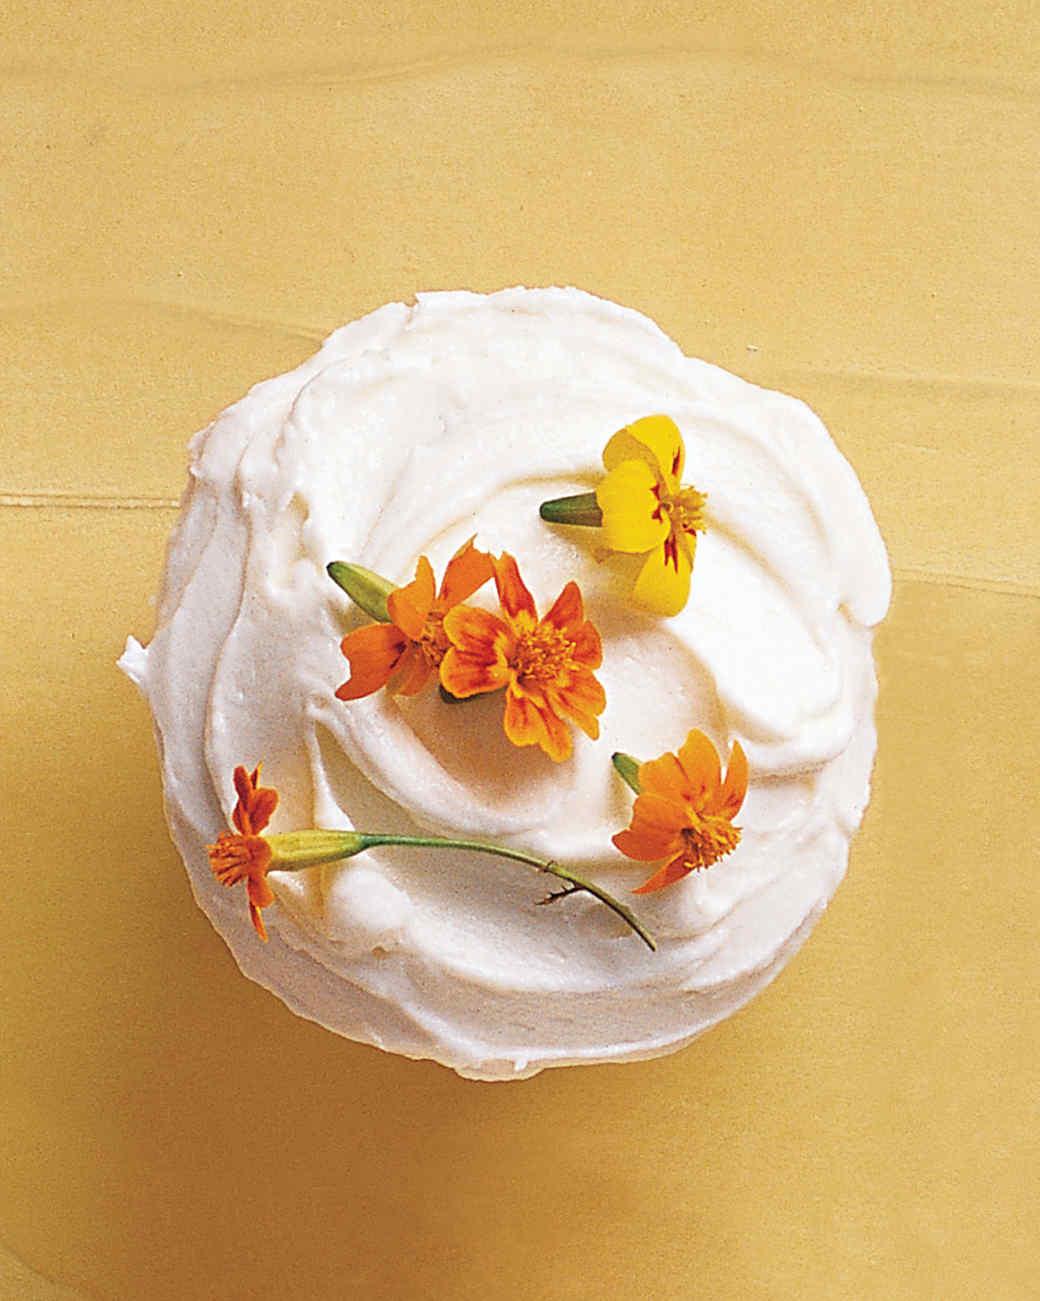 Edible-Flowers Cupcakes